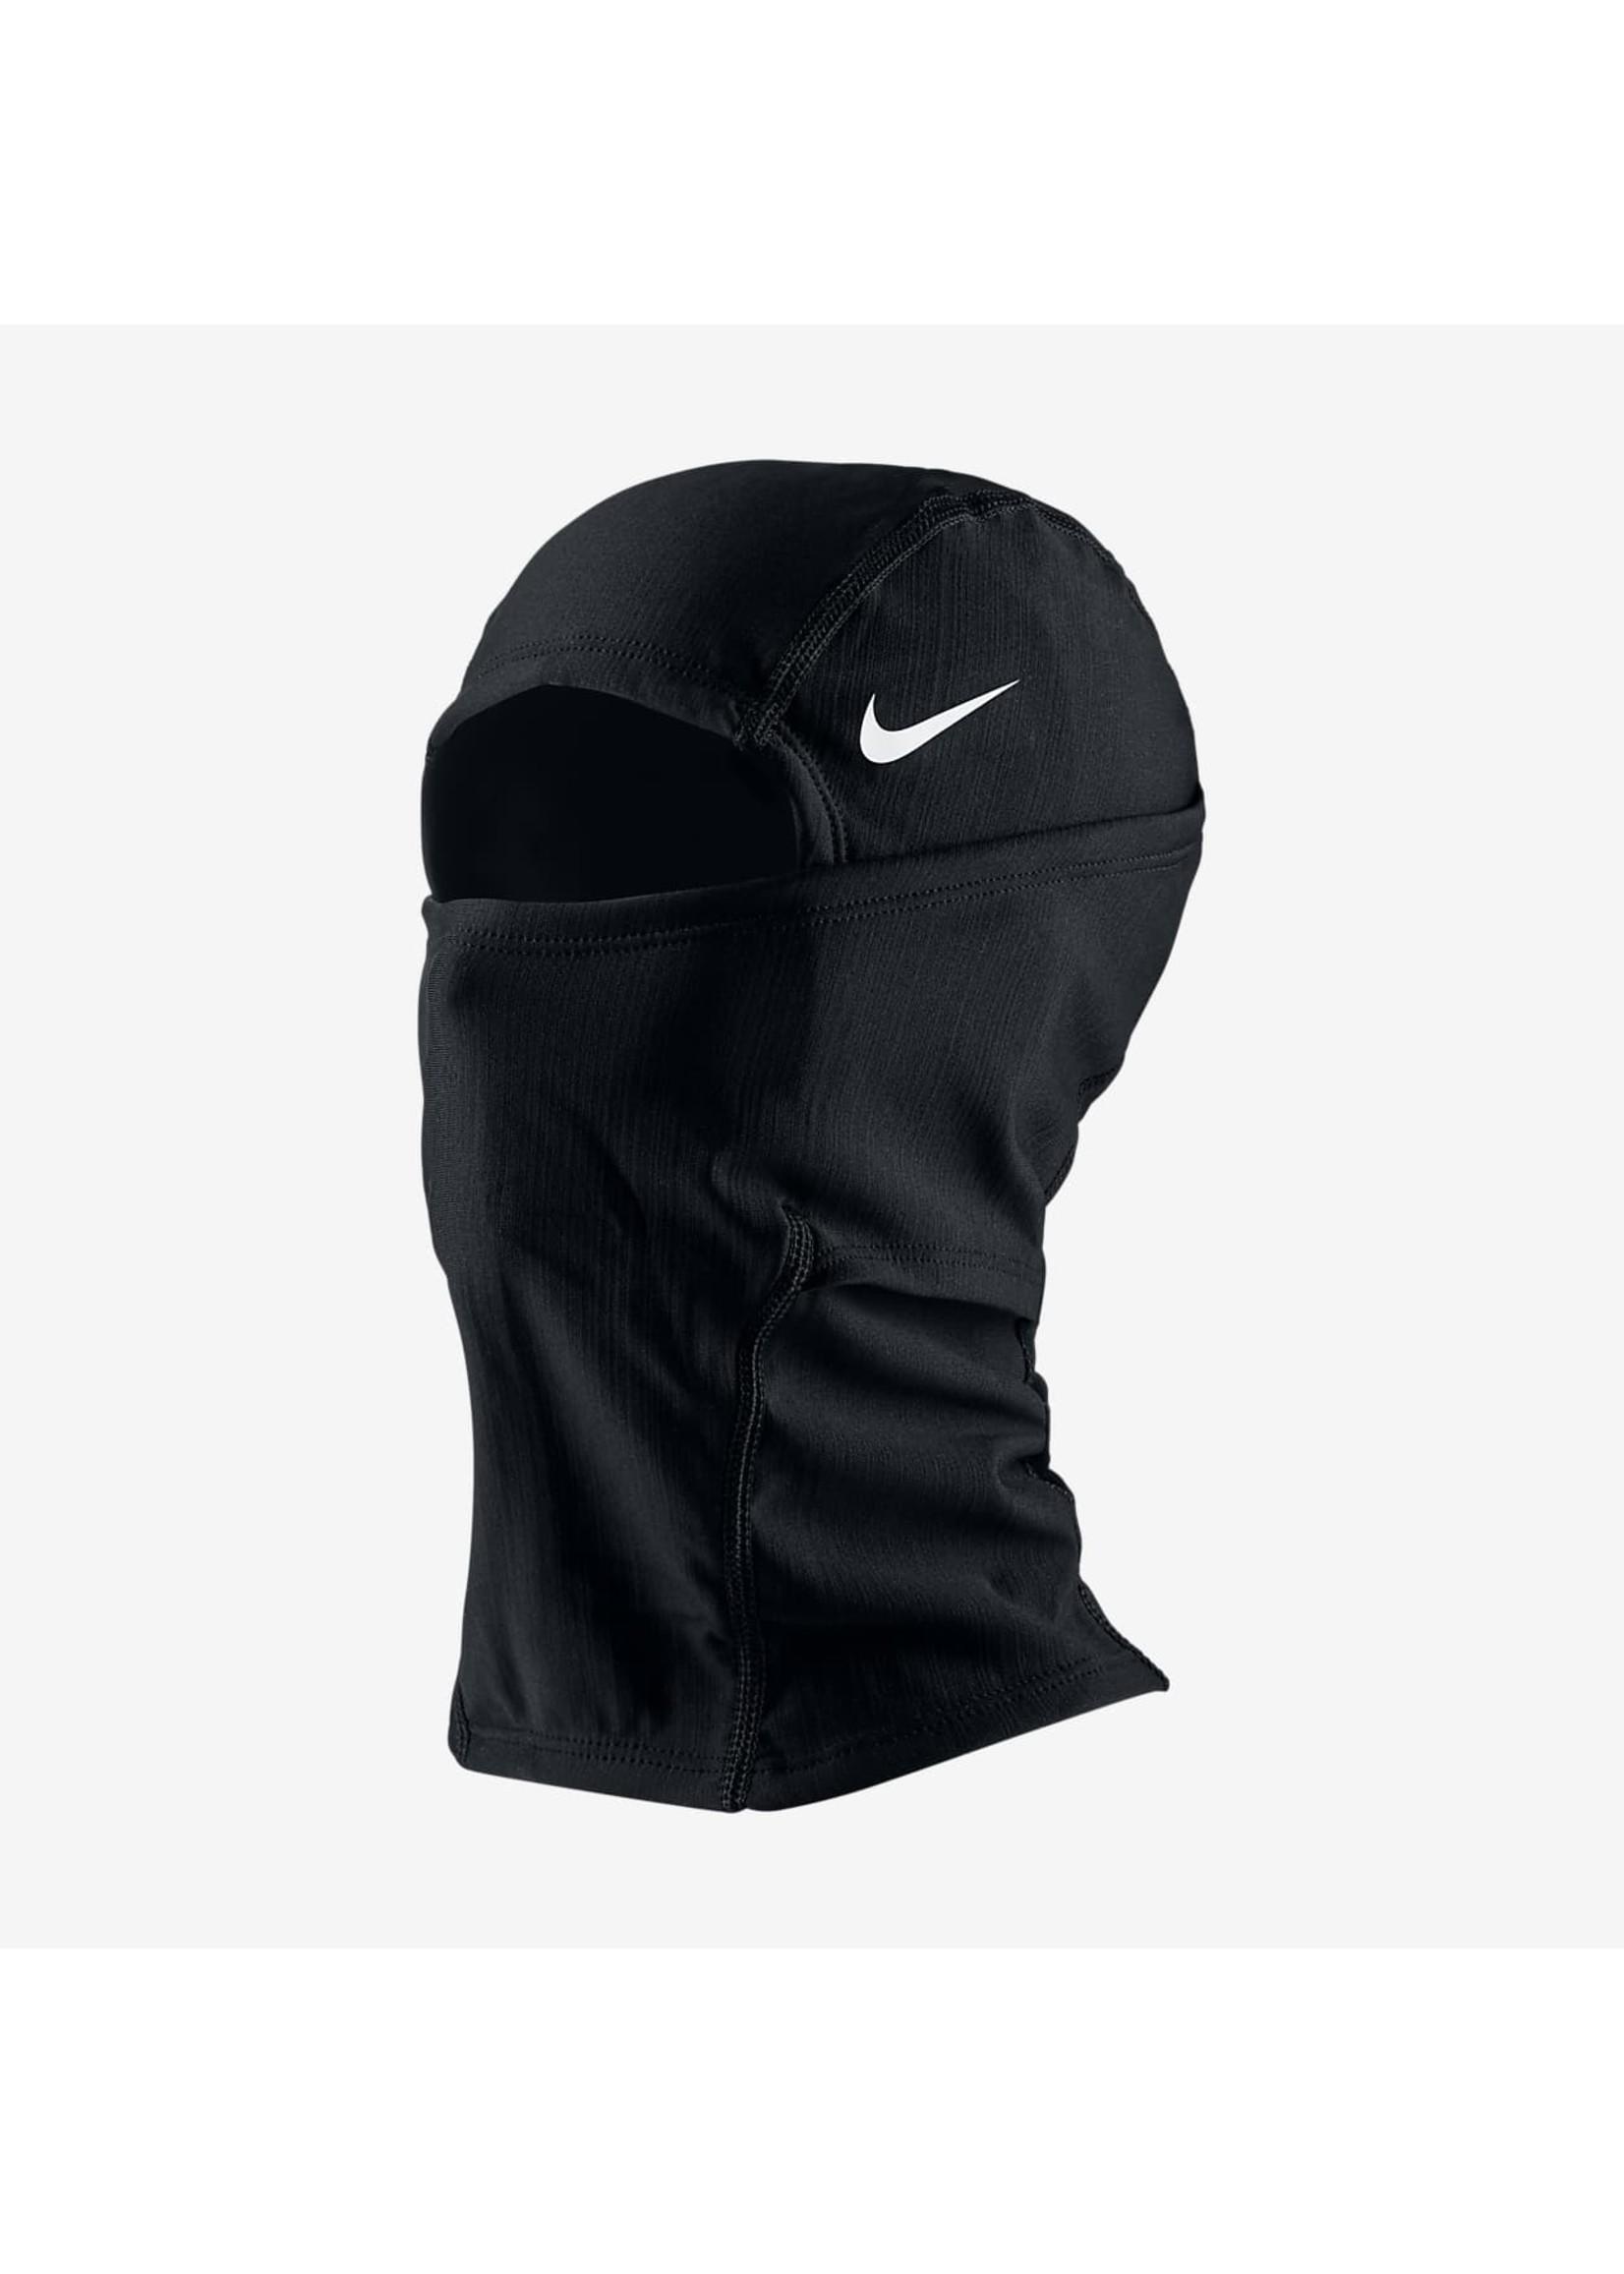 Nike Hyperwarm Hood Pro